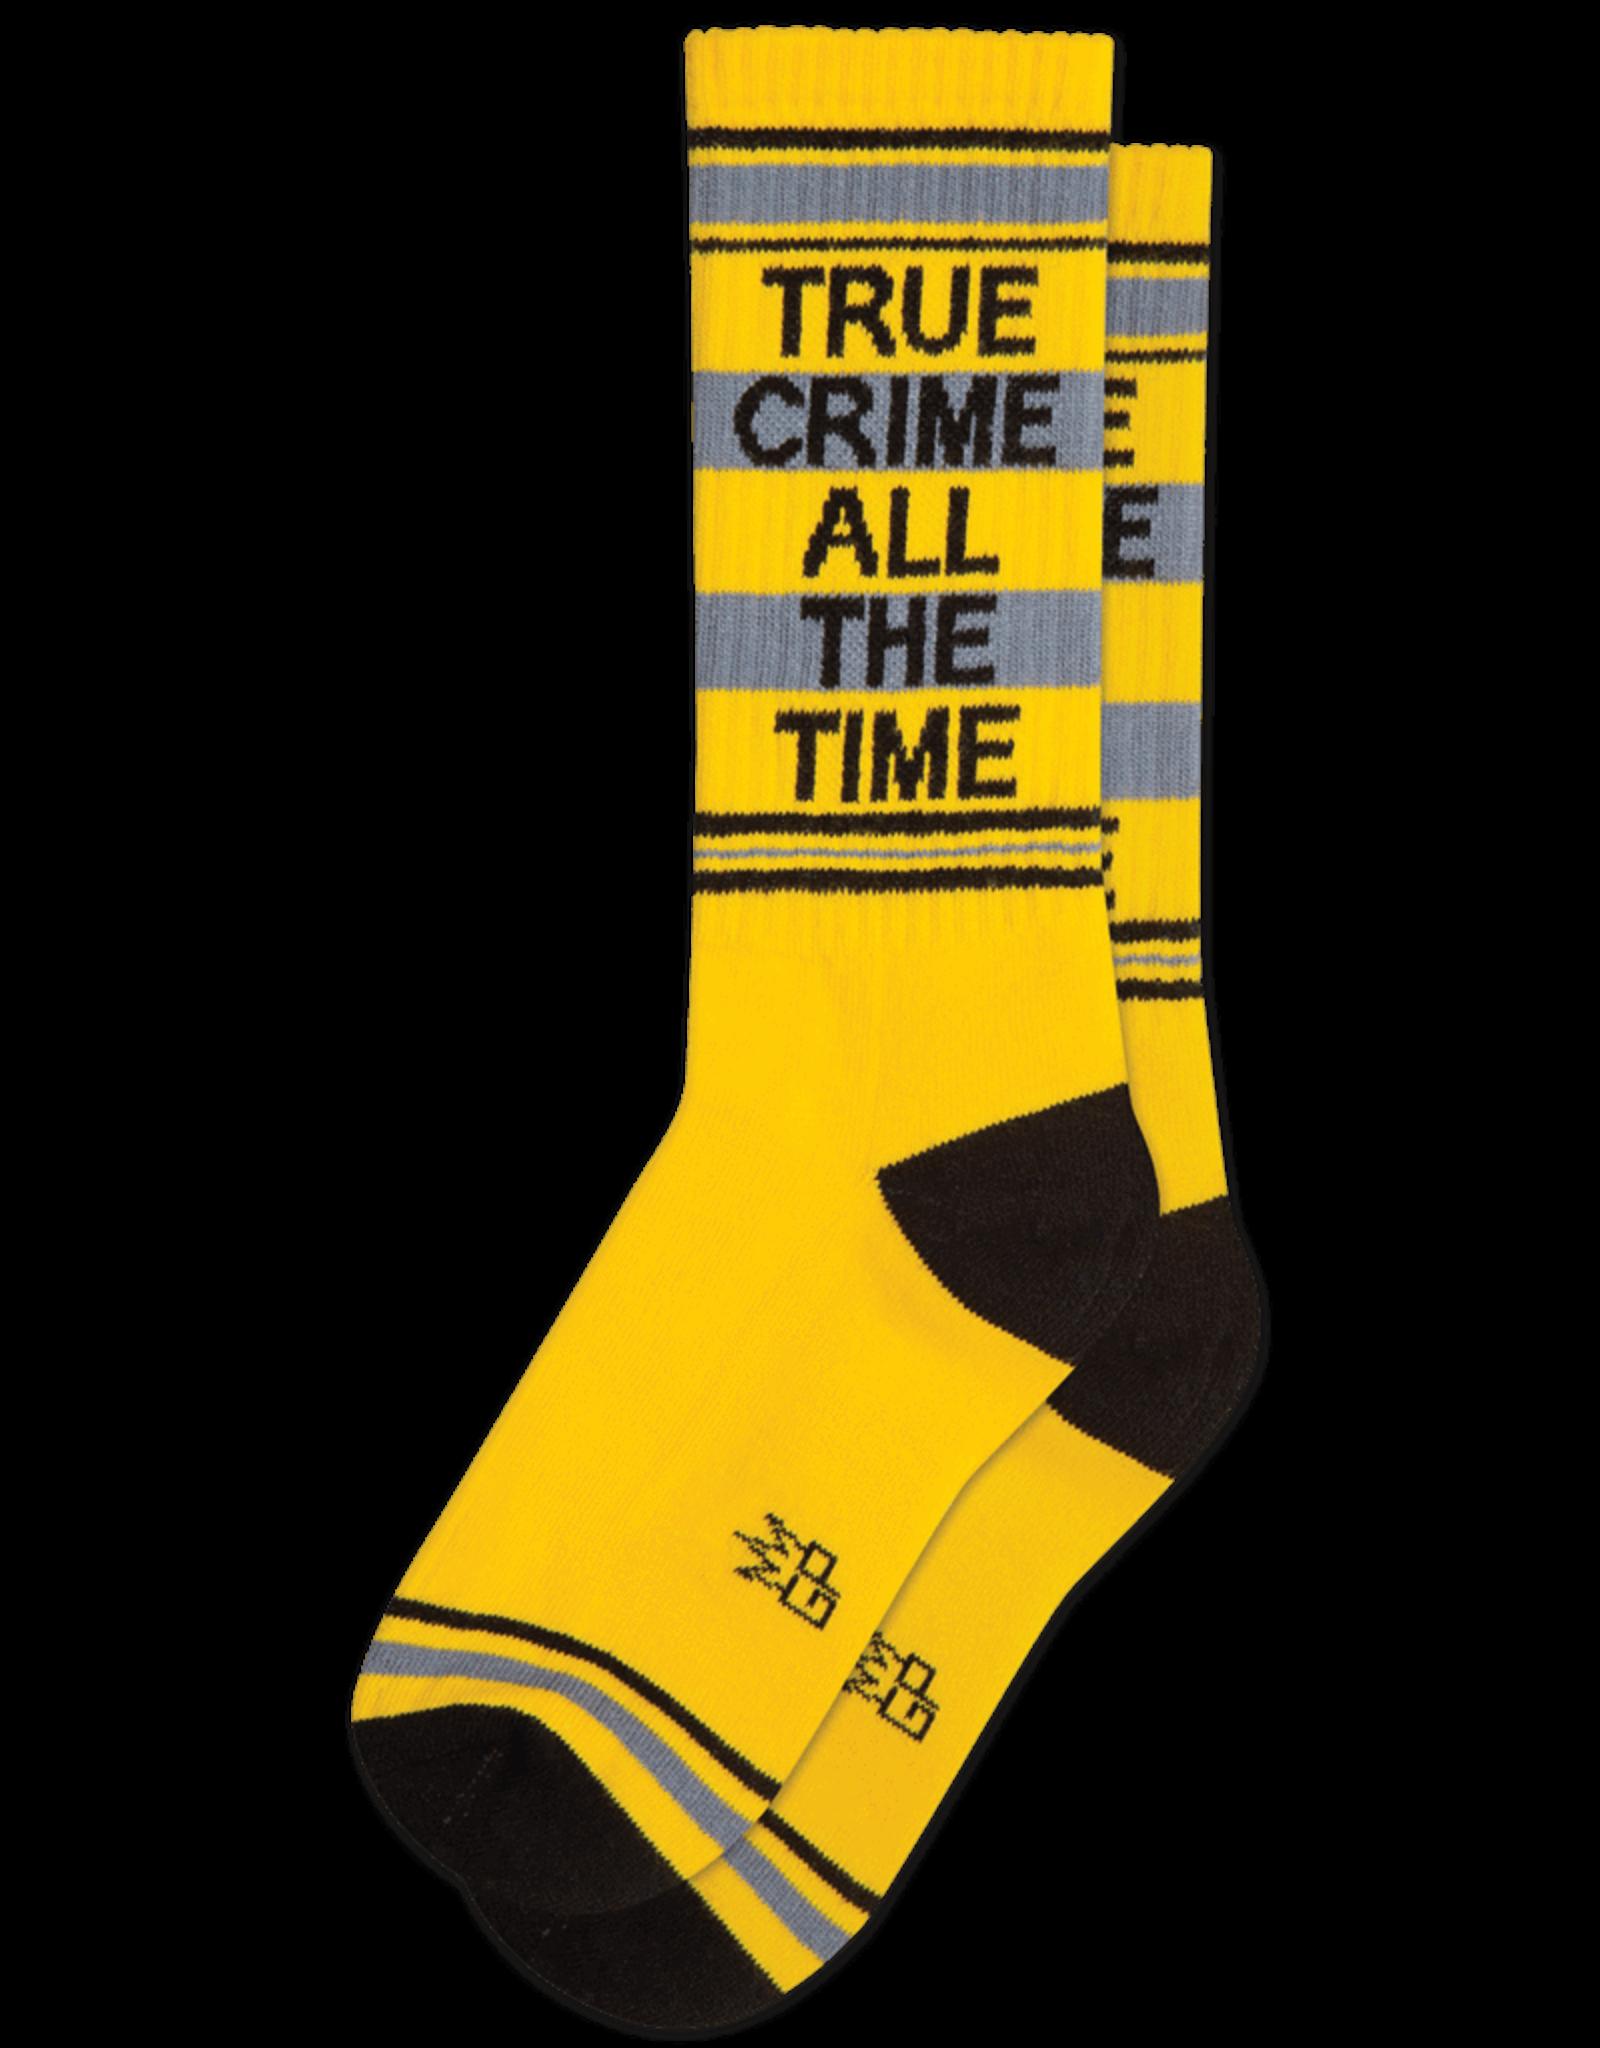 Gumball Poodle Athletic Socks: True Crime